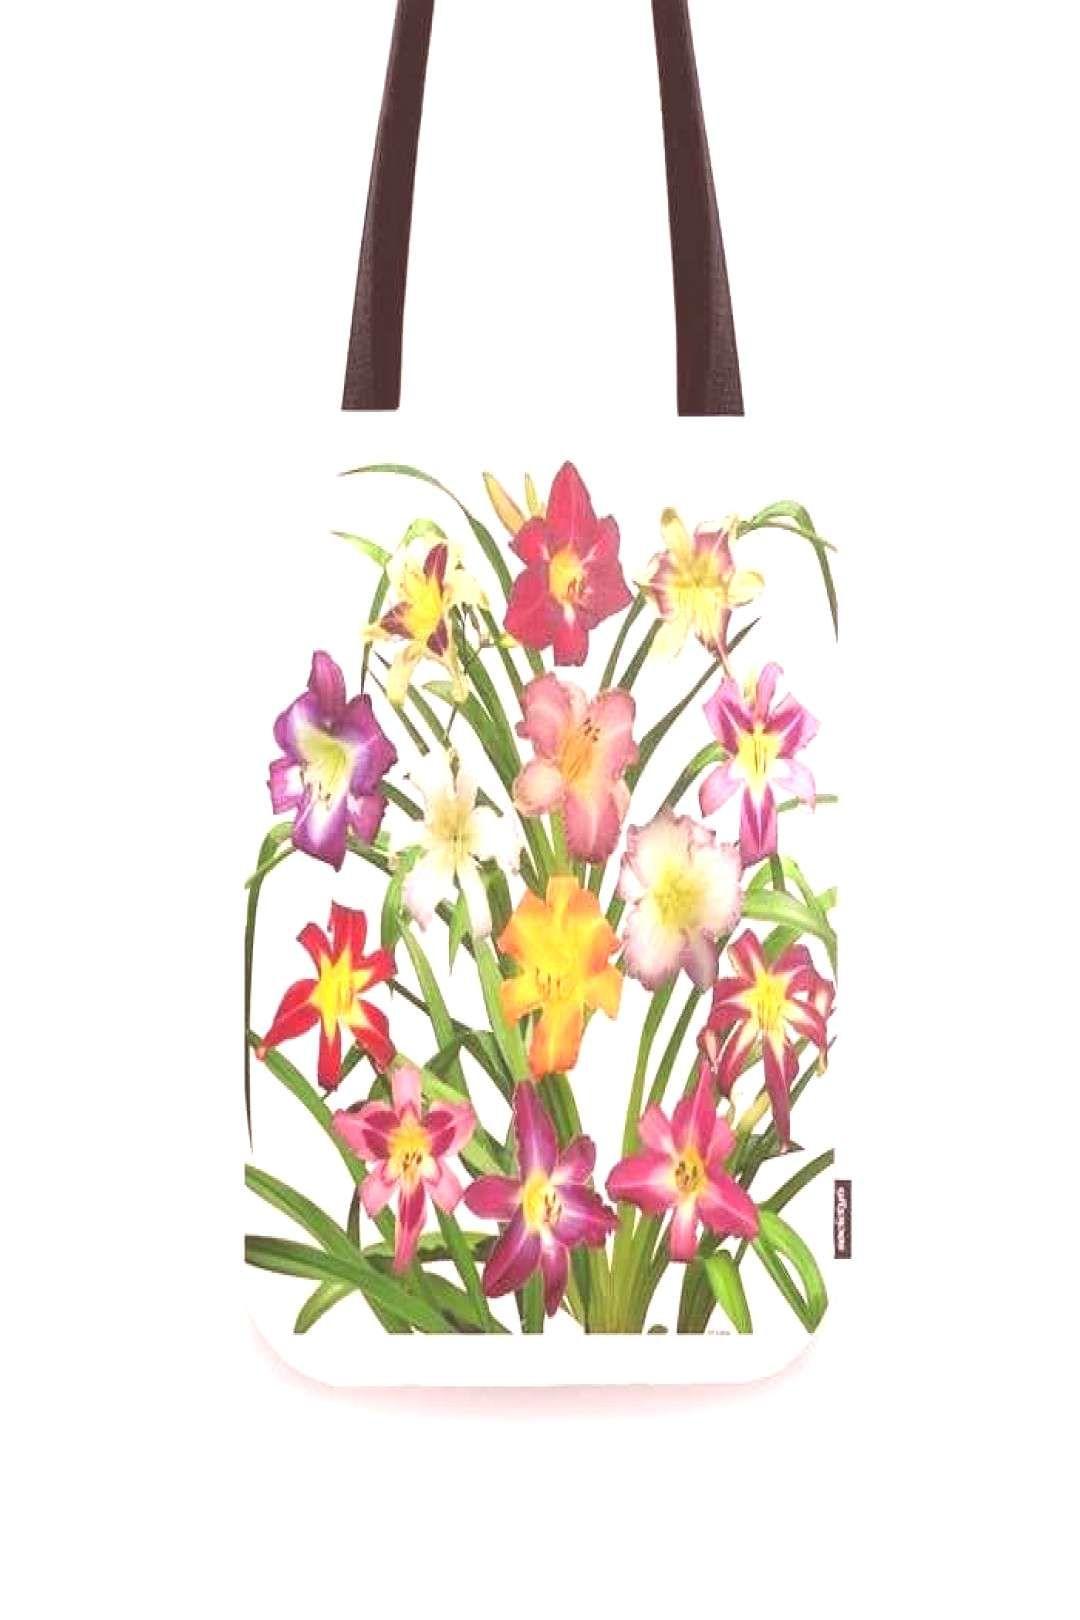 Daylilies To